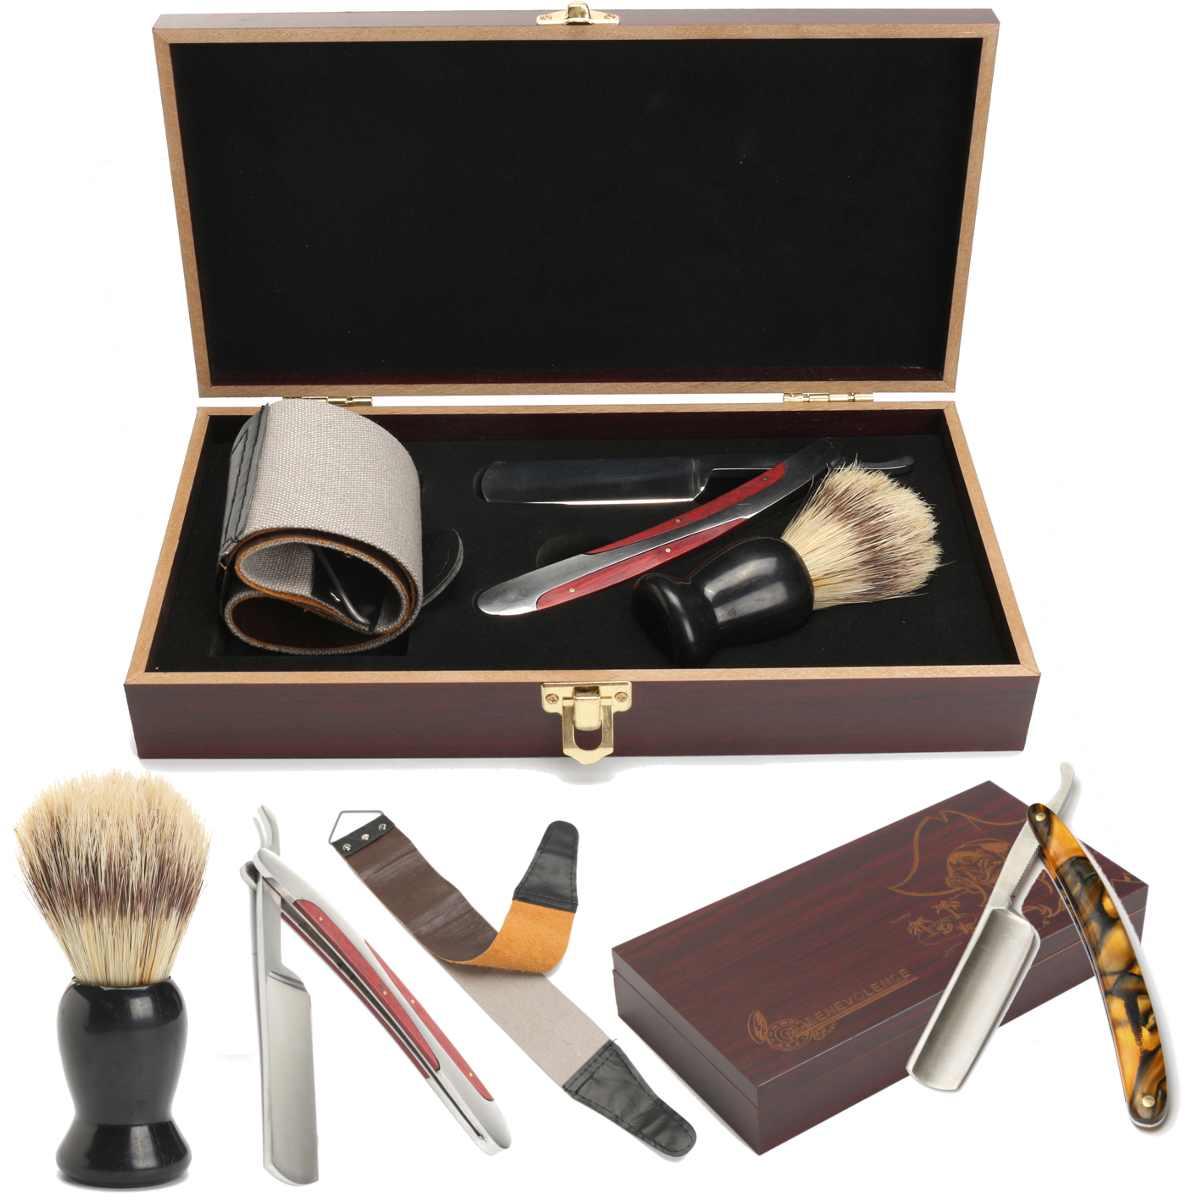 Manual de Shaver Kits com Caixa de Madeira do Vintage Presentes Titular Folding Barbear Faca Barba Barbeiro Cortador 4pcs